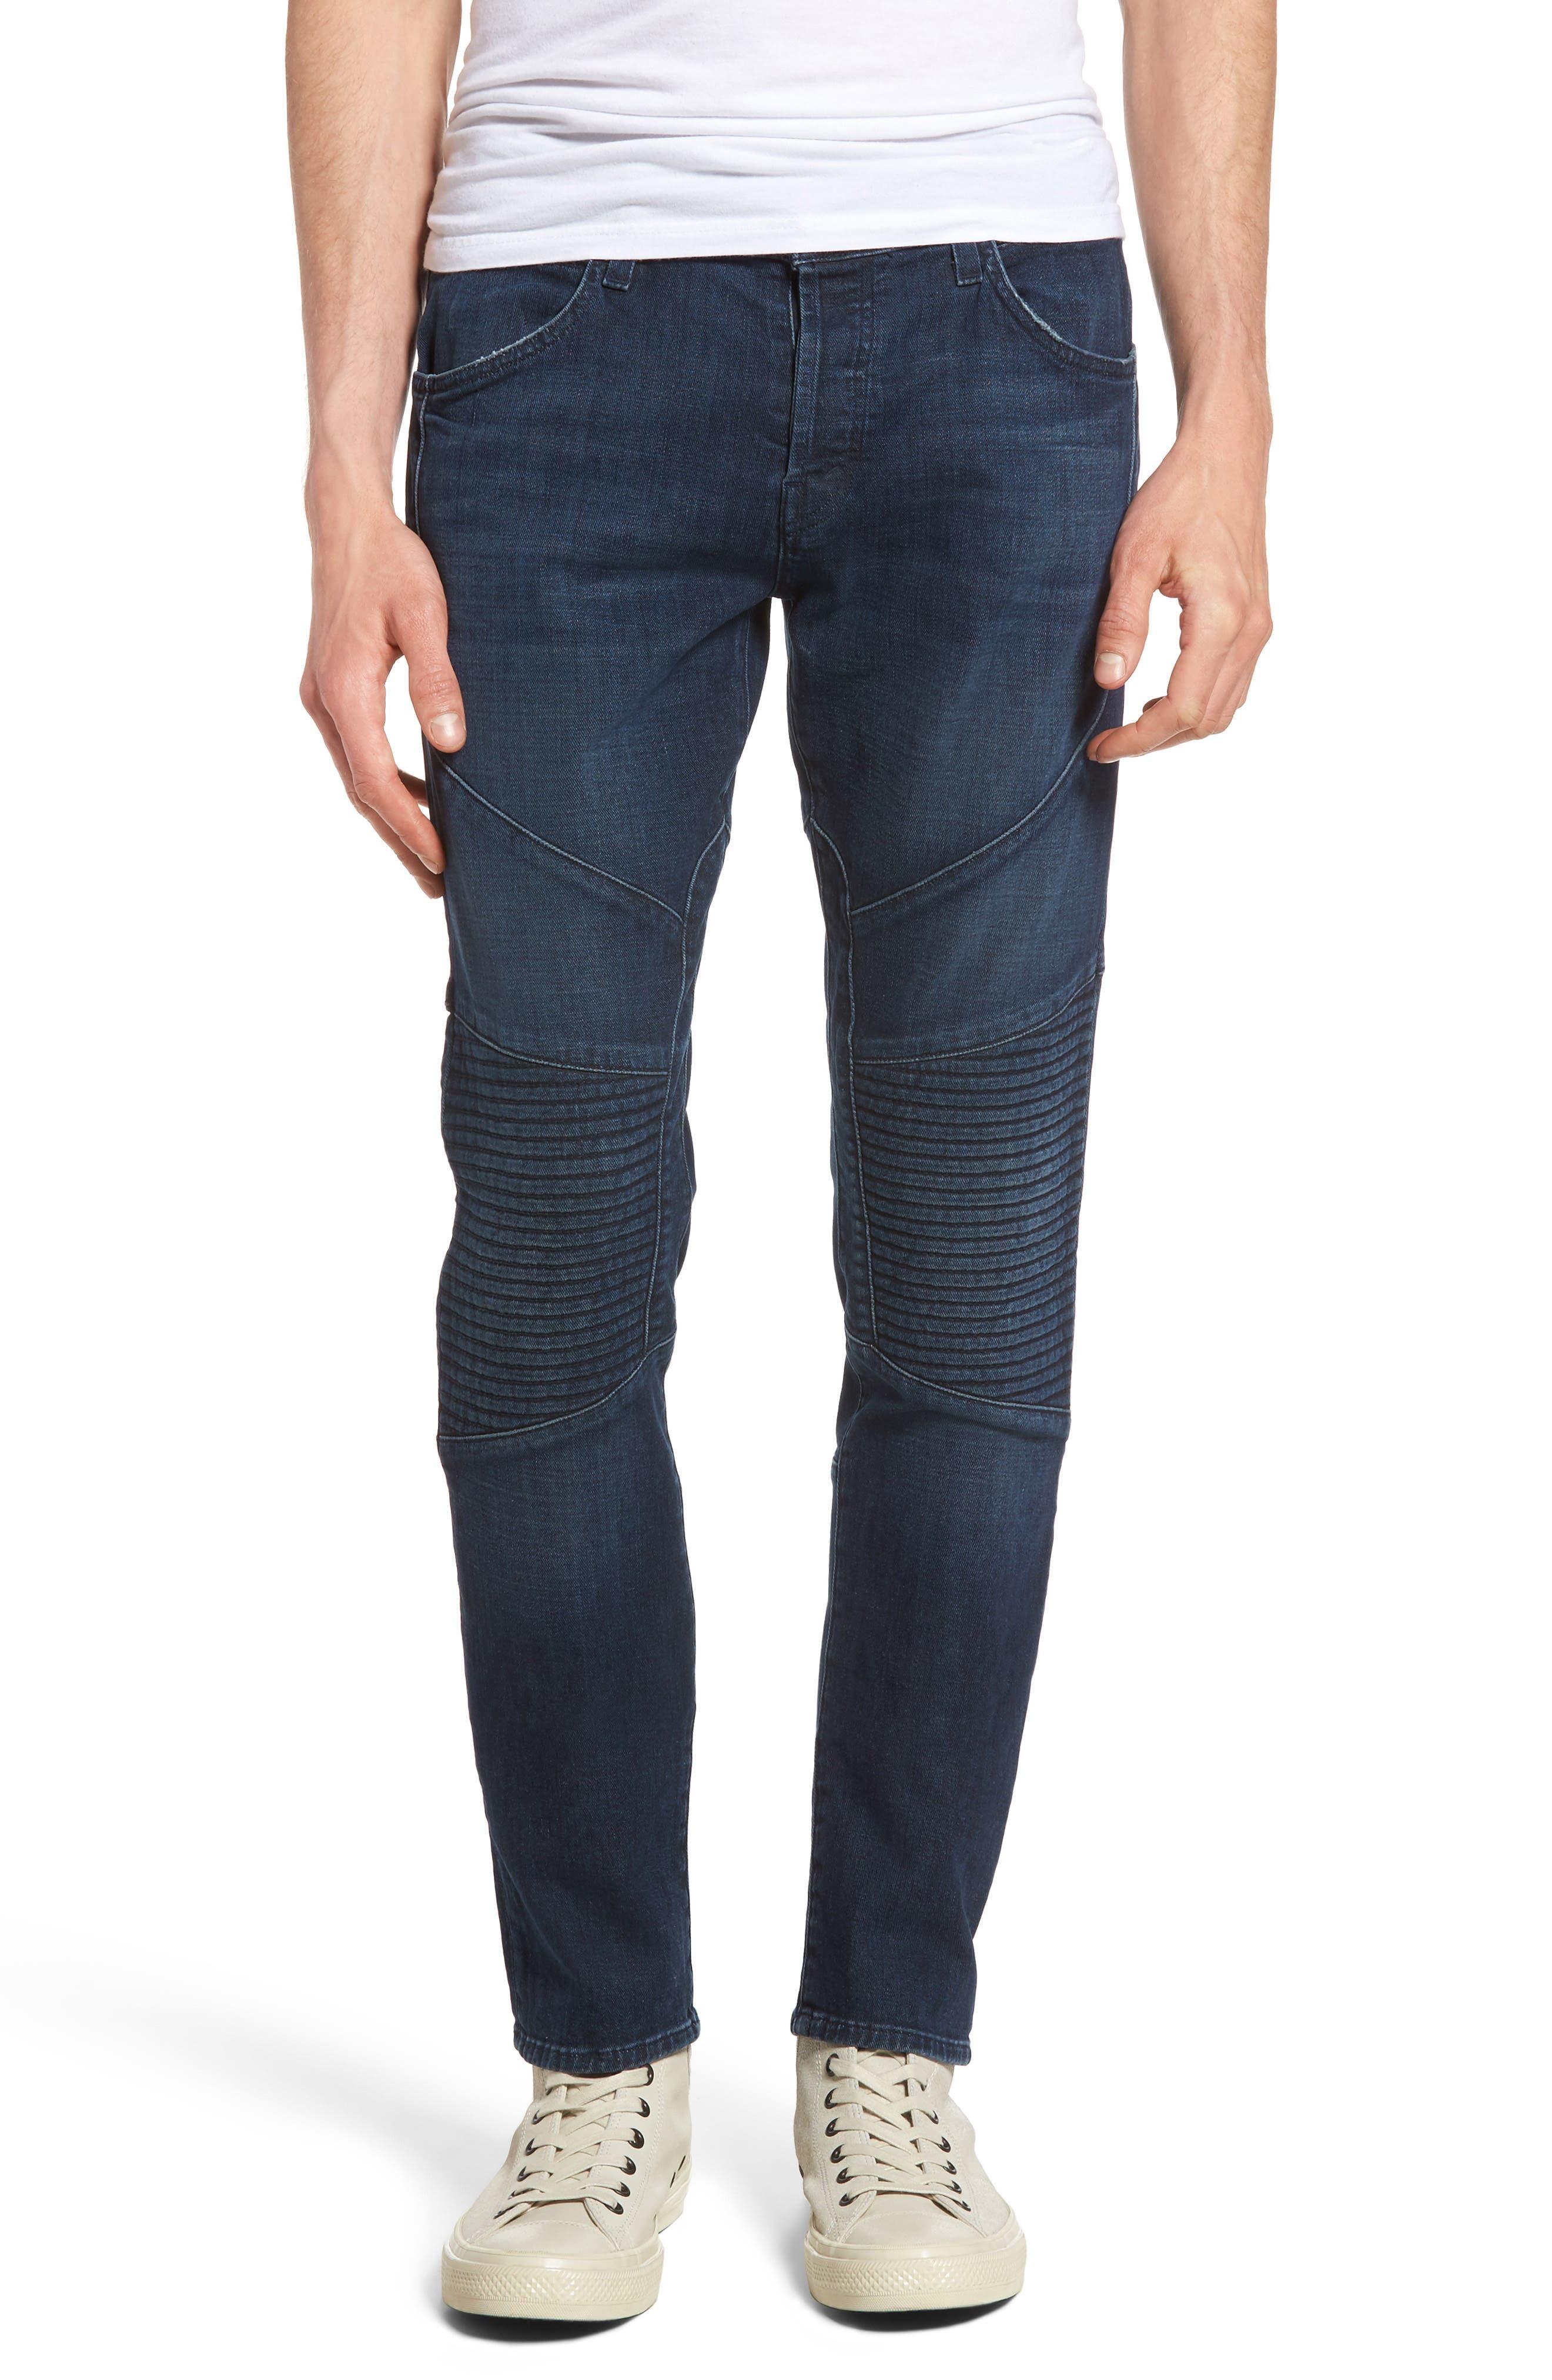 Main Image - J Brand Bearden Moto Skinny Fit Jeans (Bluvalis)